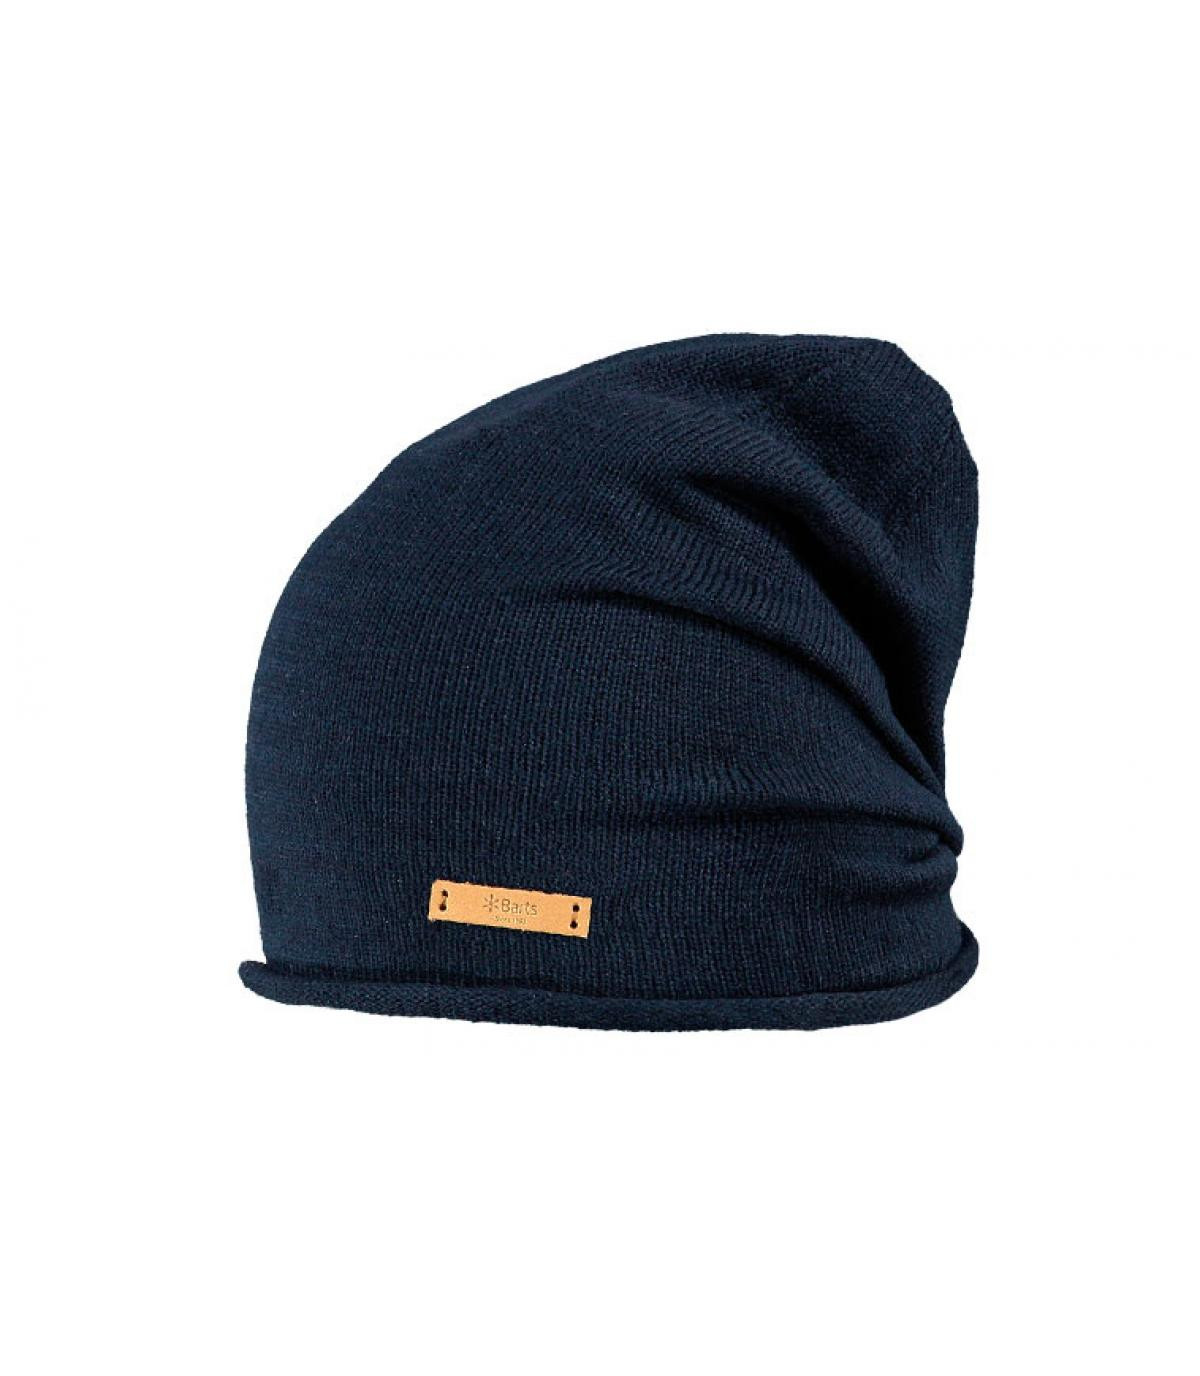 Bonnet long bleu foncé